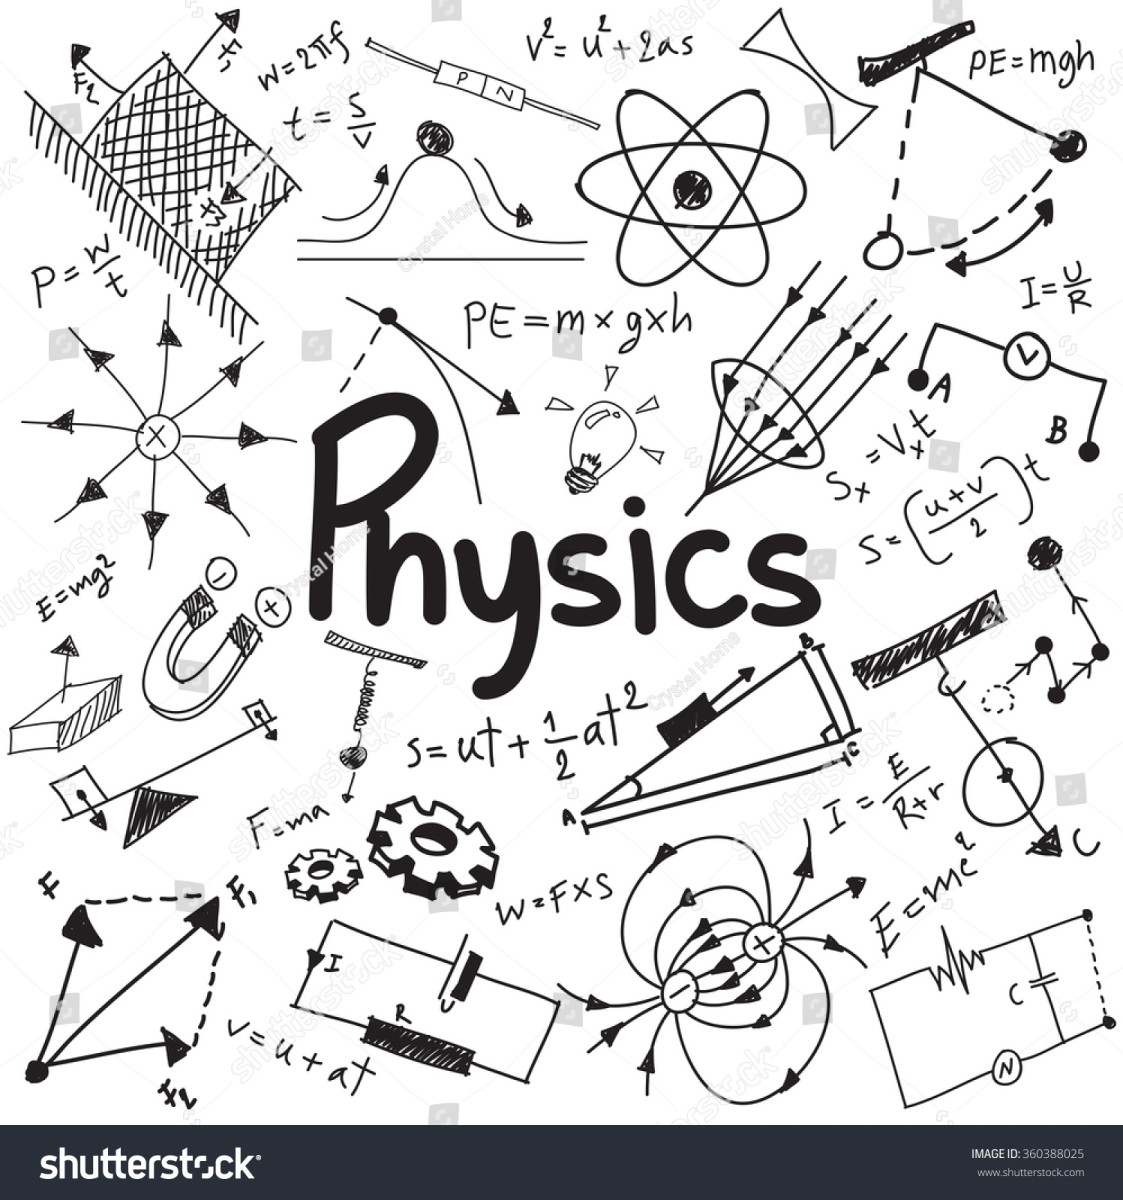 Basic Physics Lesson - 17: Sound